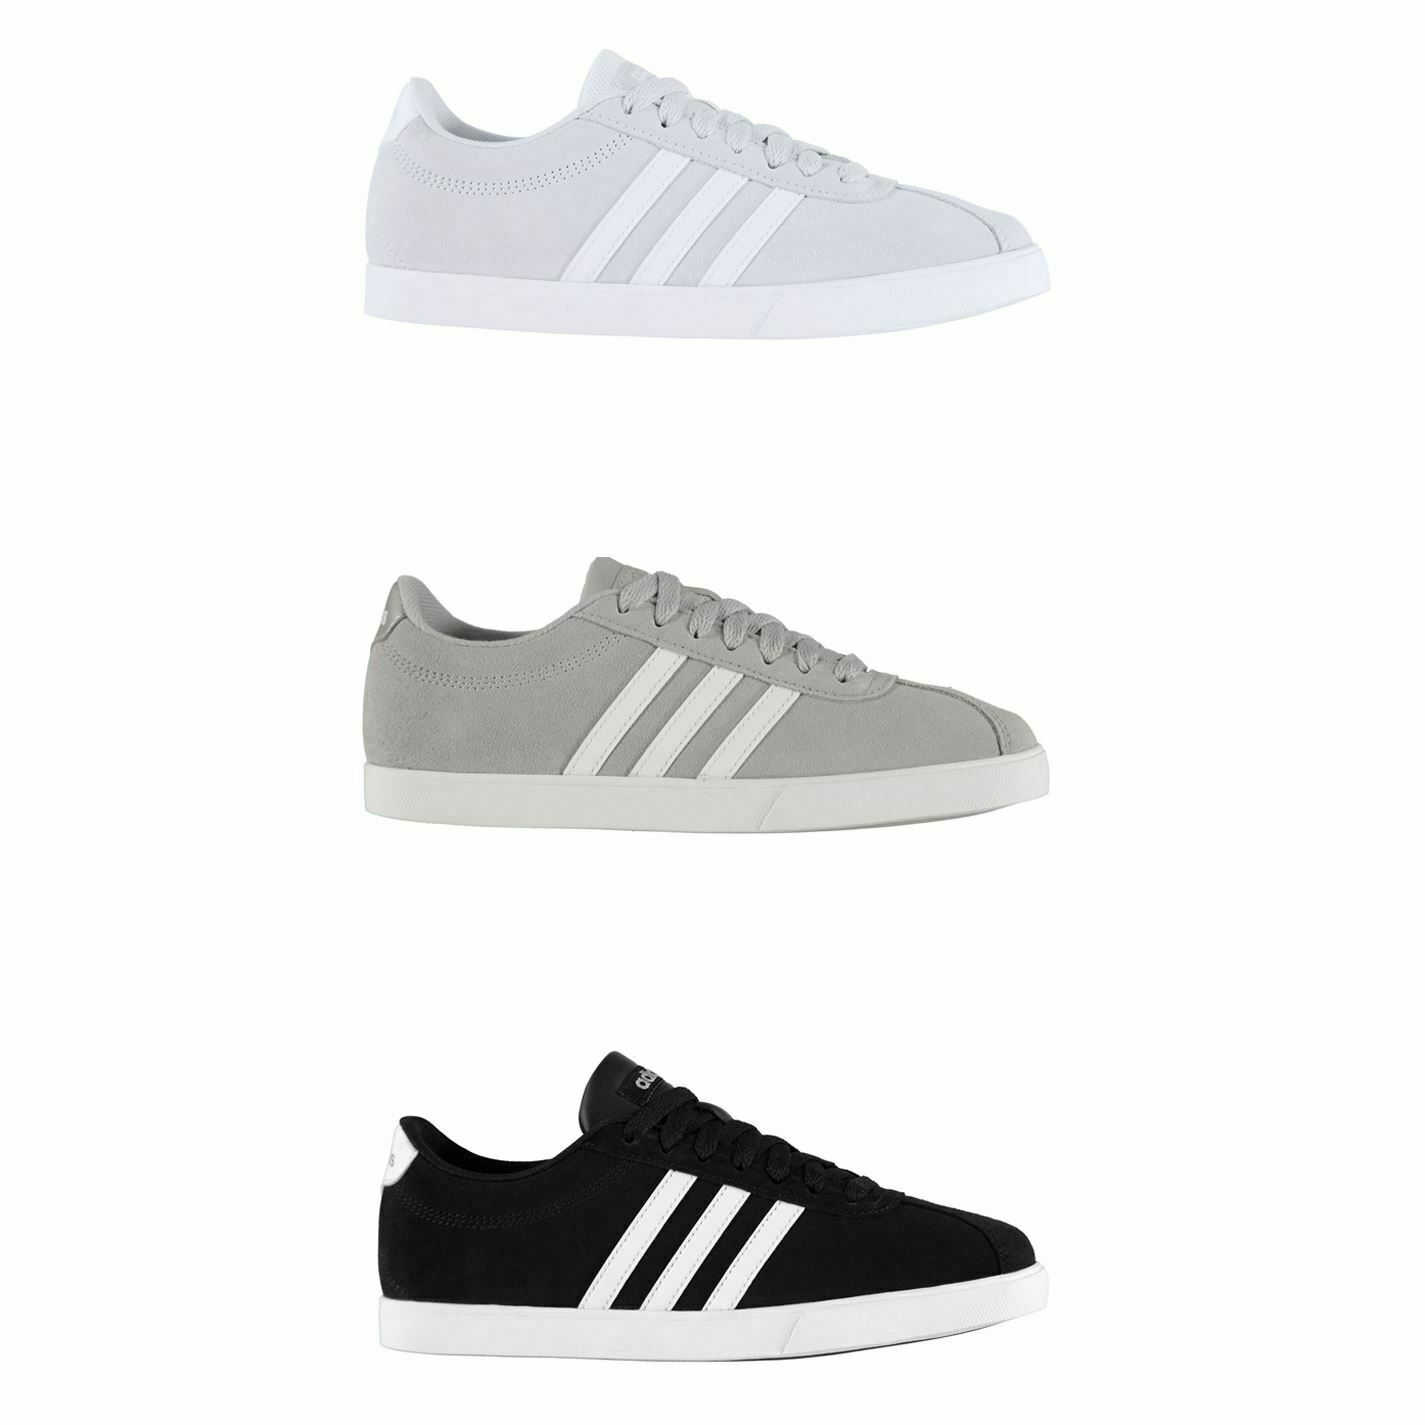 Adidas Court Set Suede Trainers femmes Athleisure baskets chaussures Footwear